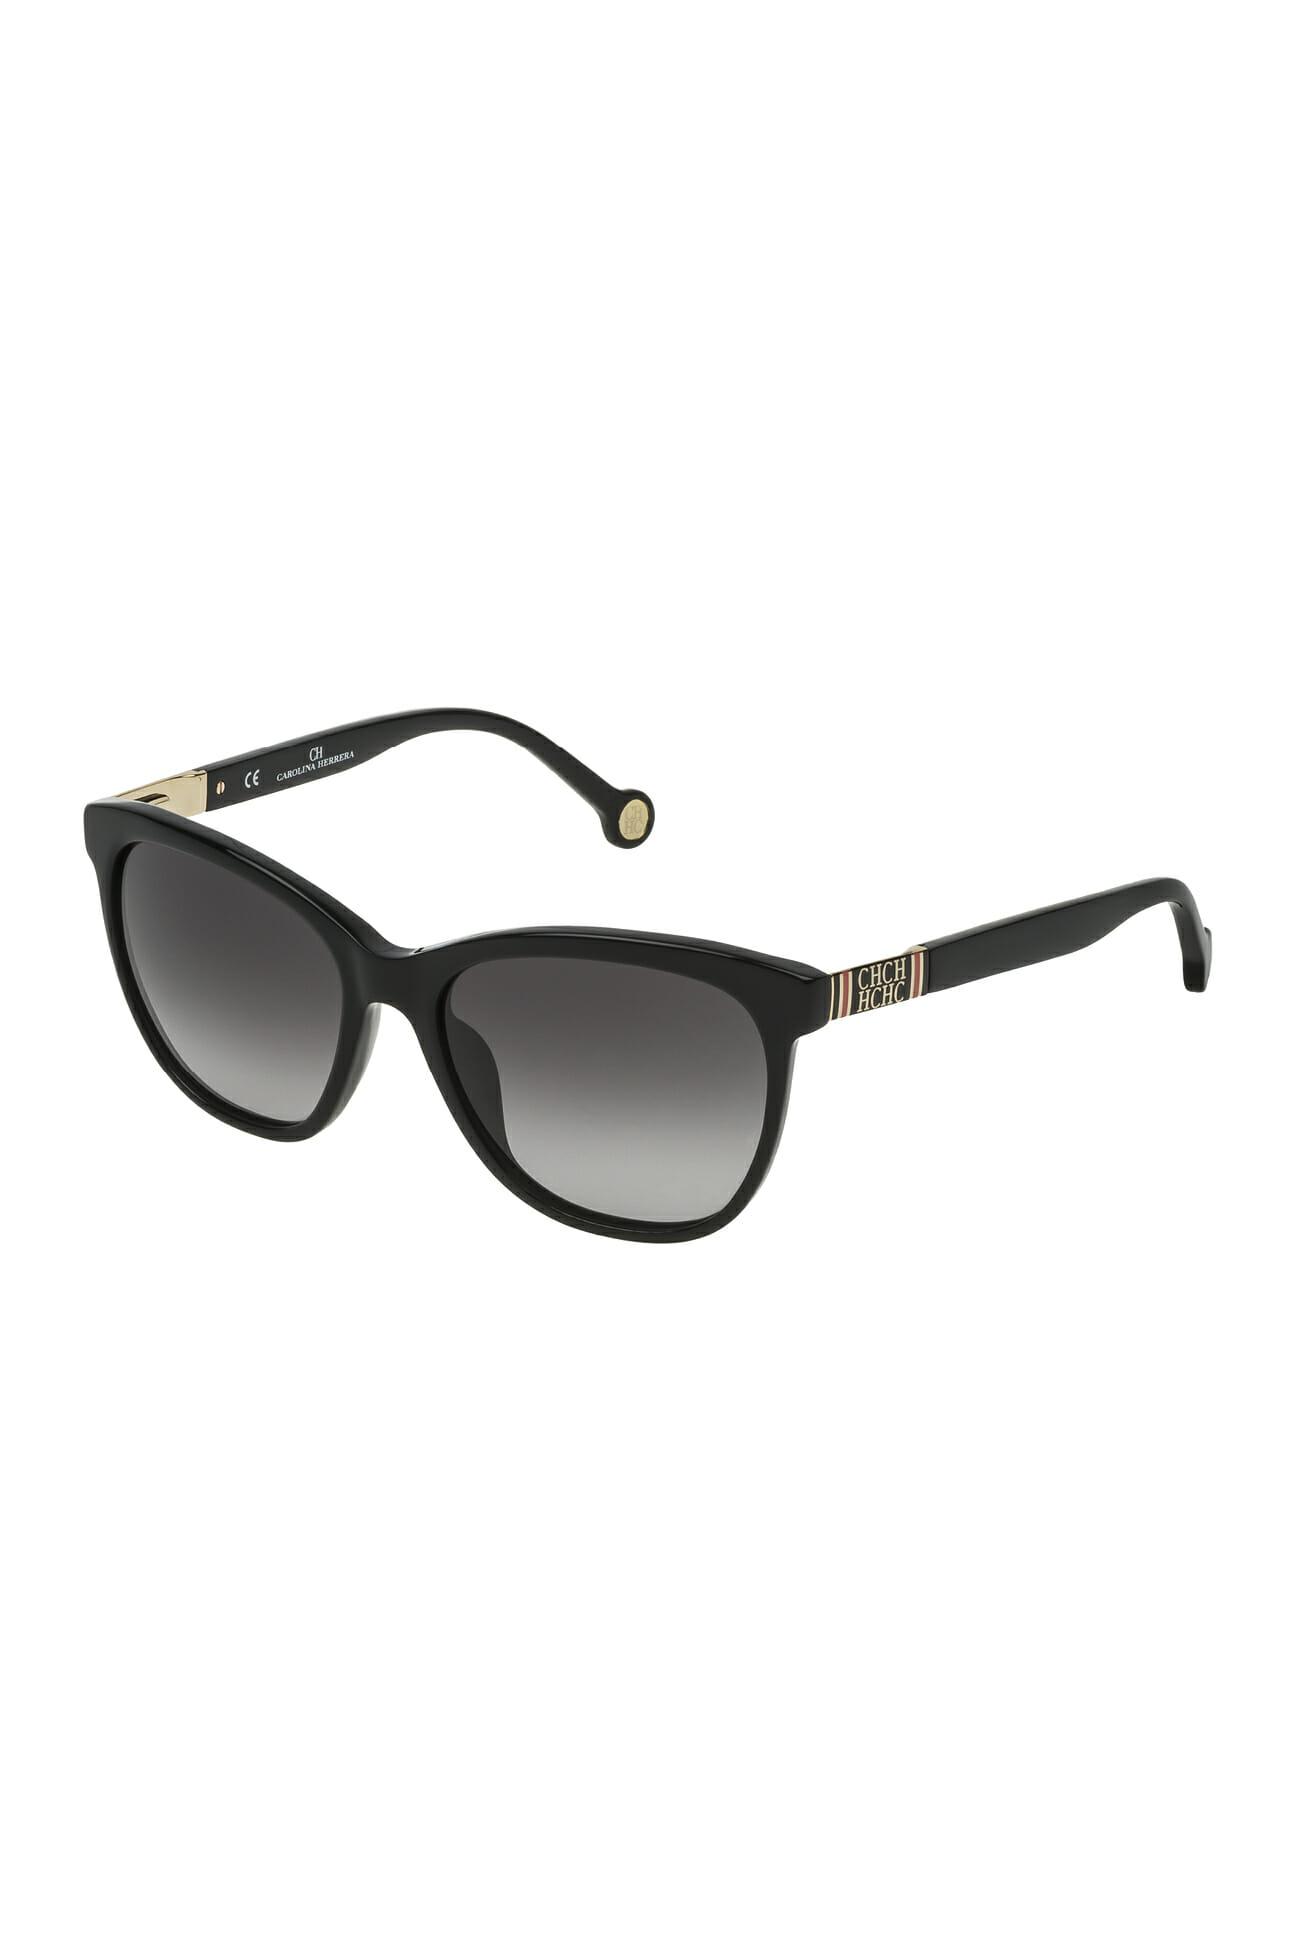 Carolina Herrera New York 212 Sunglasses Www Tapdance Org